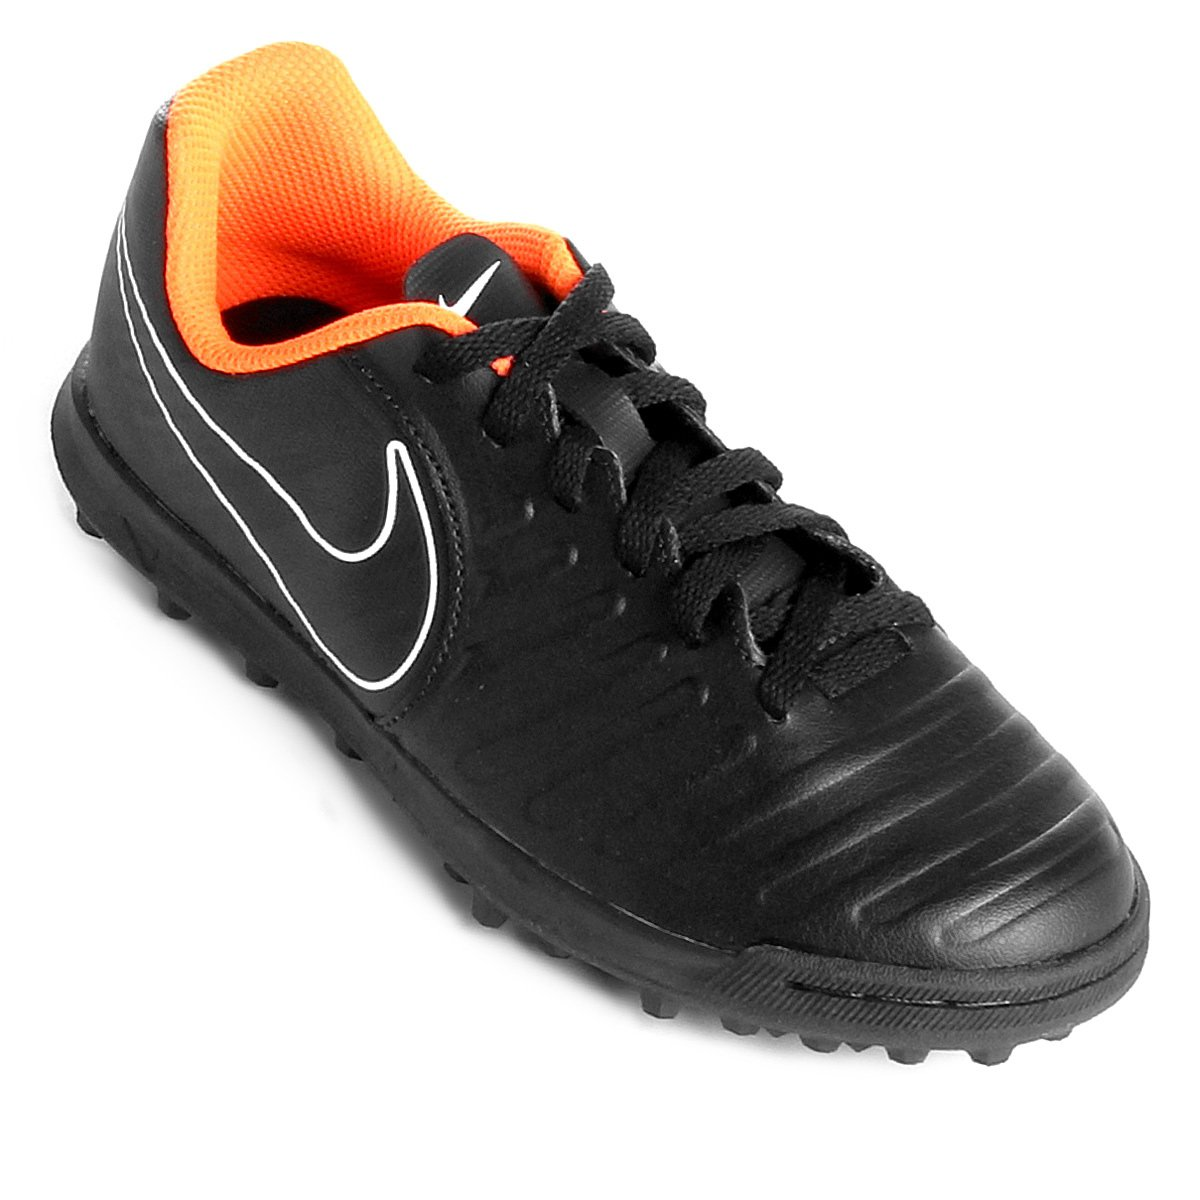 96c8272904 Chuteira Society Infantil Nike Tiempo Legend 7 Club TF